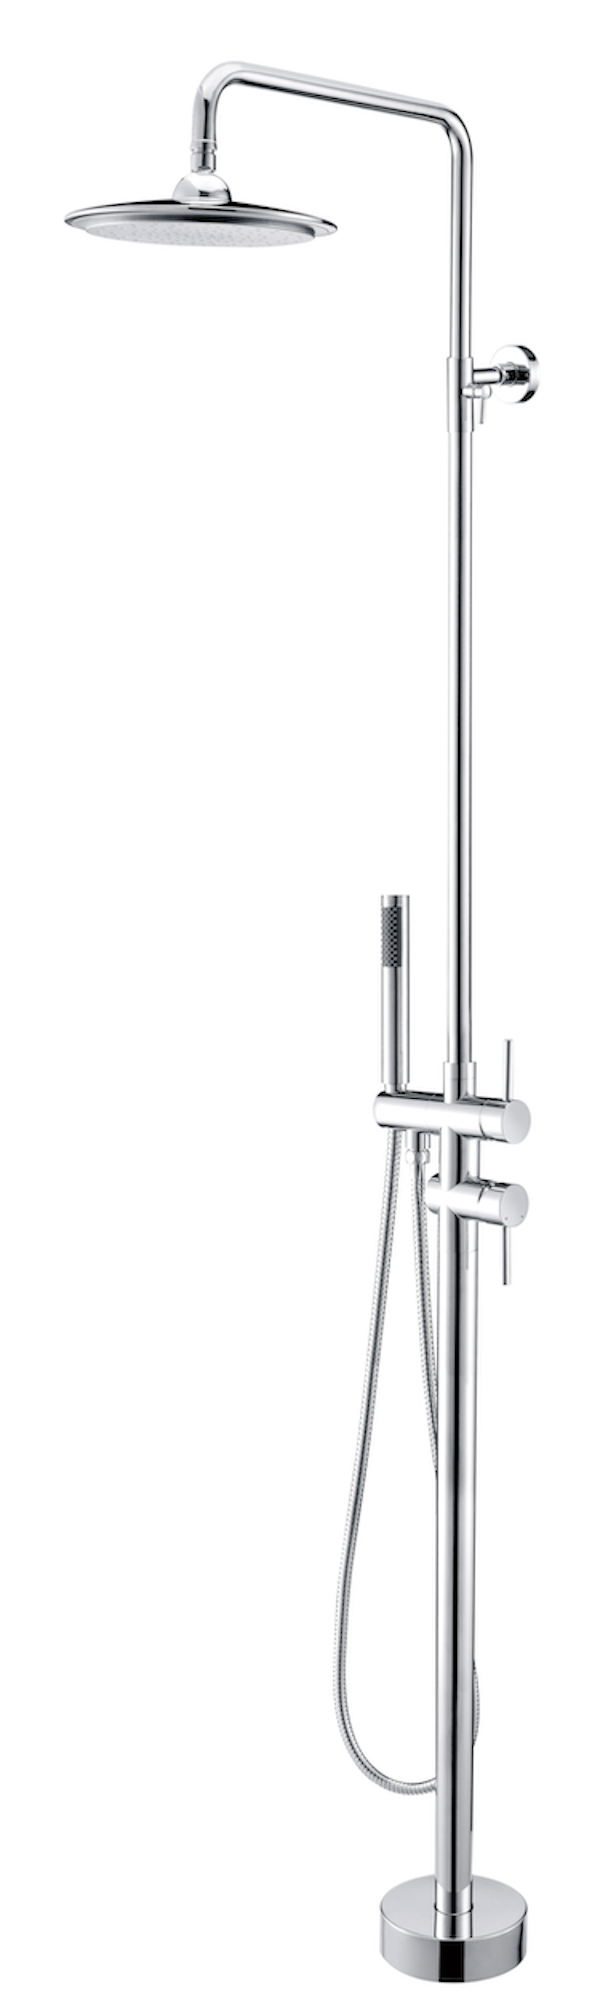 Brausegarnitur Struktur Jurva (Chrom)